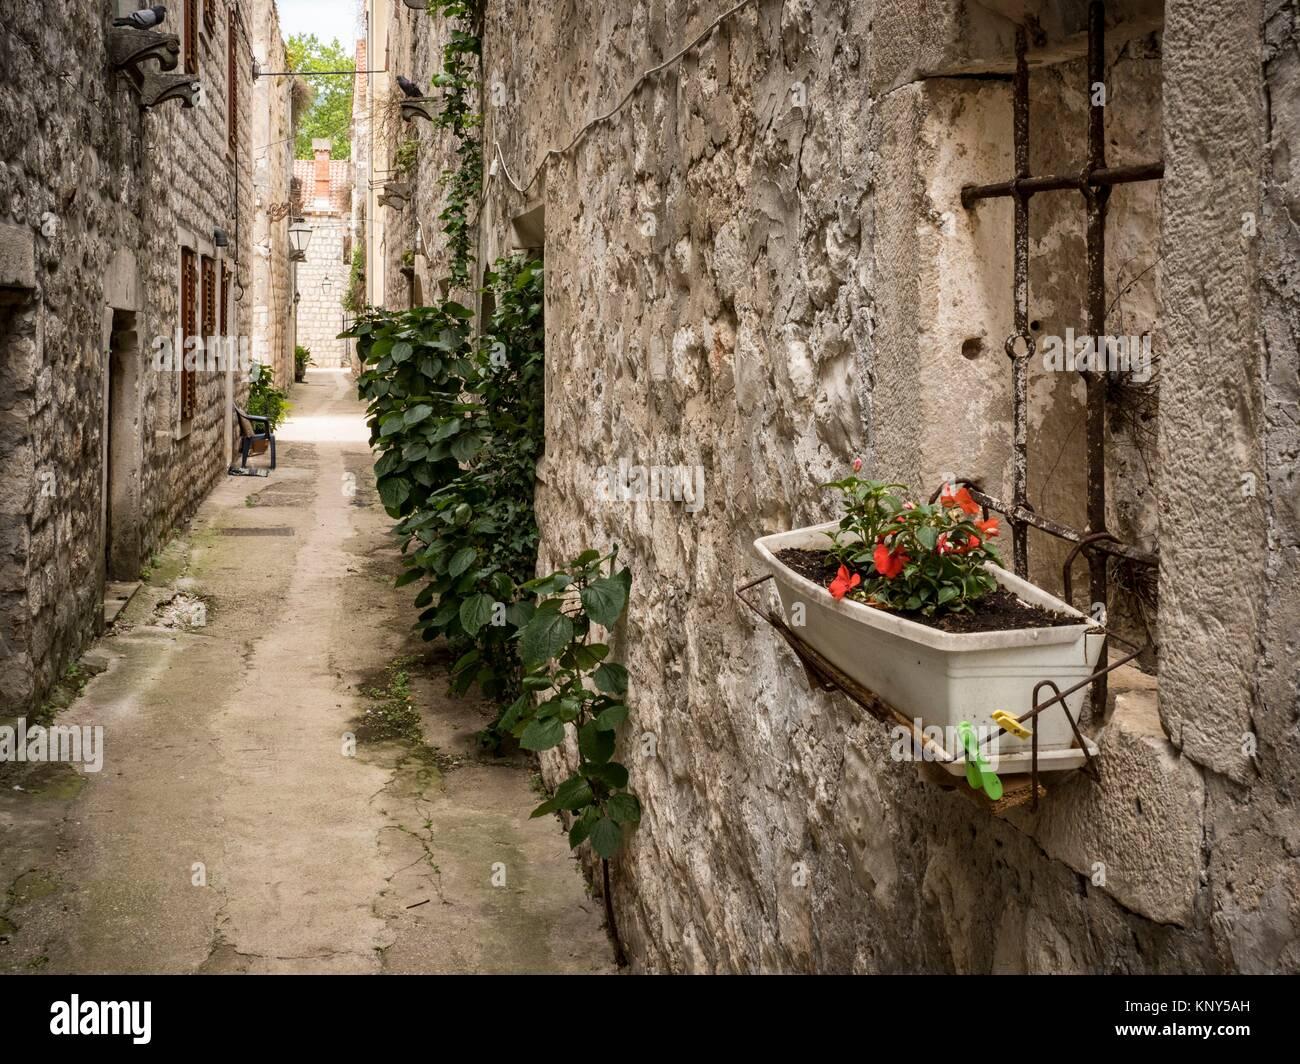 Ston Croatia. - Stock Image